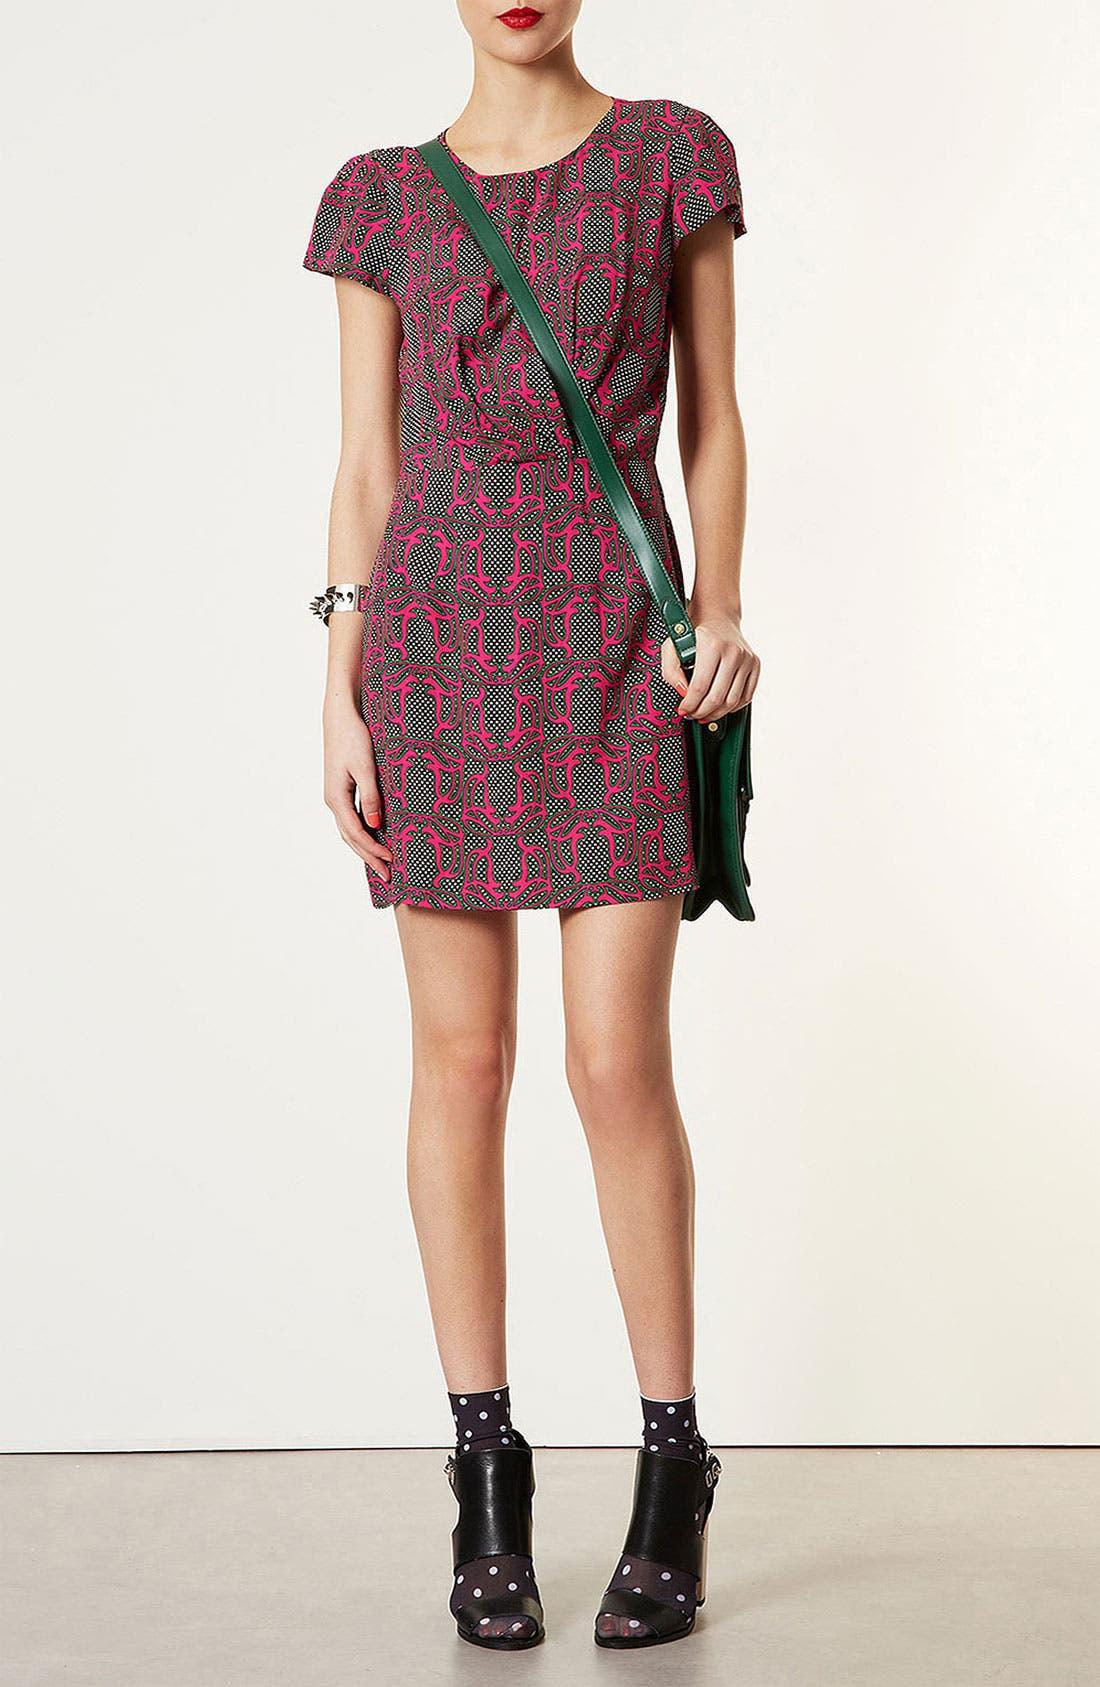 Alternate Image 1 Selected - Topshop 'Darcy' Vintage Print Dress